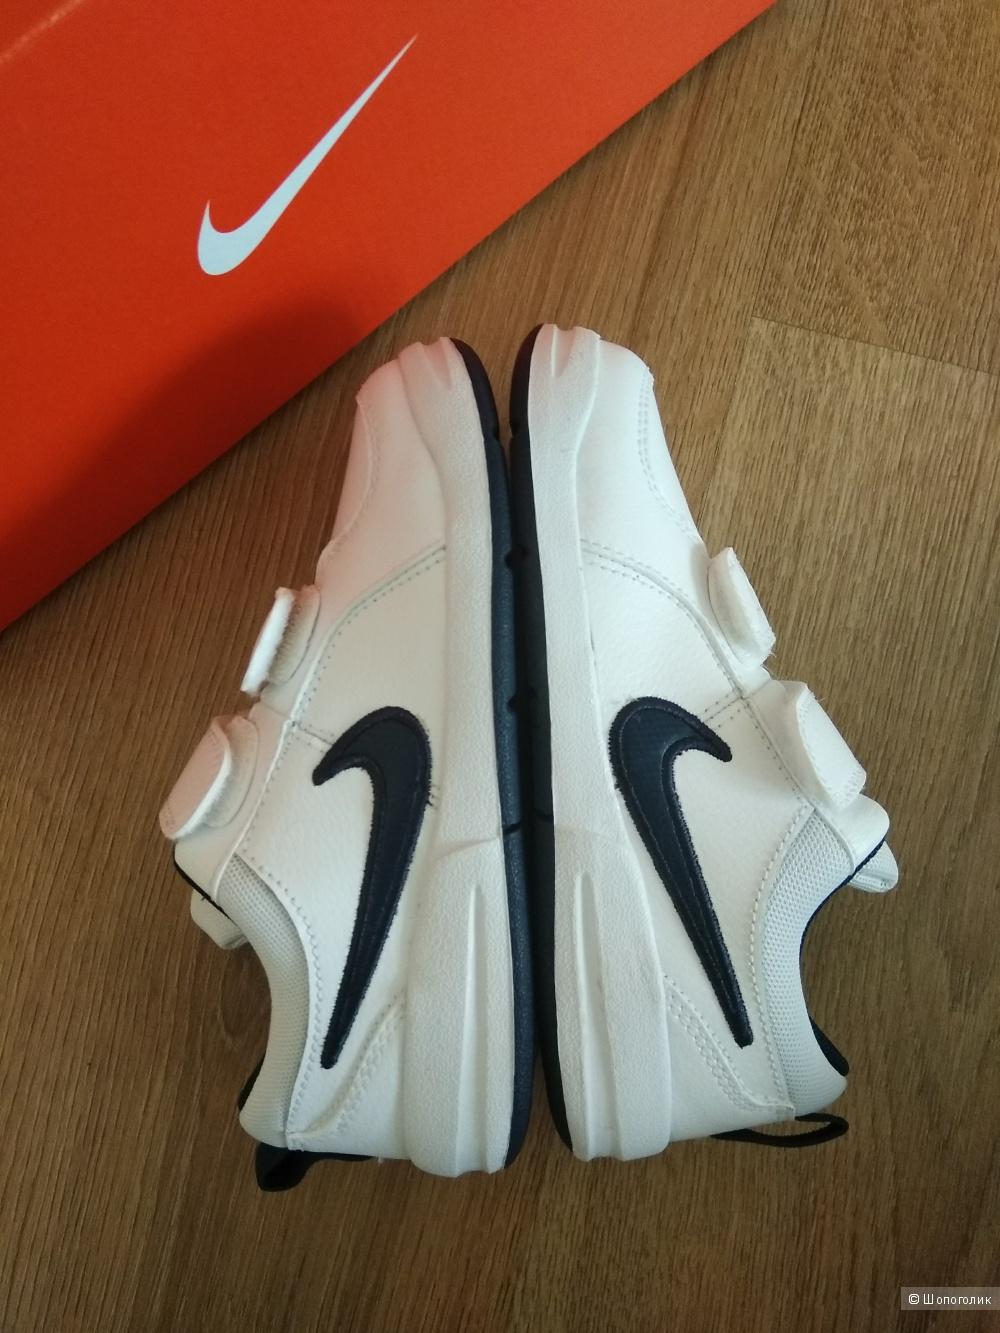 Кроссовки Nike размер 13.5 с